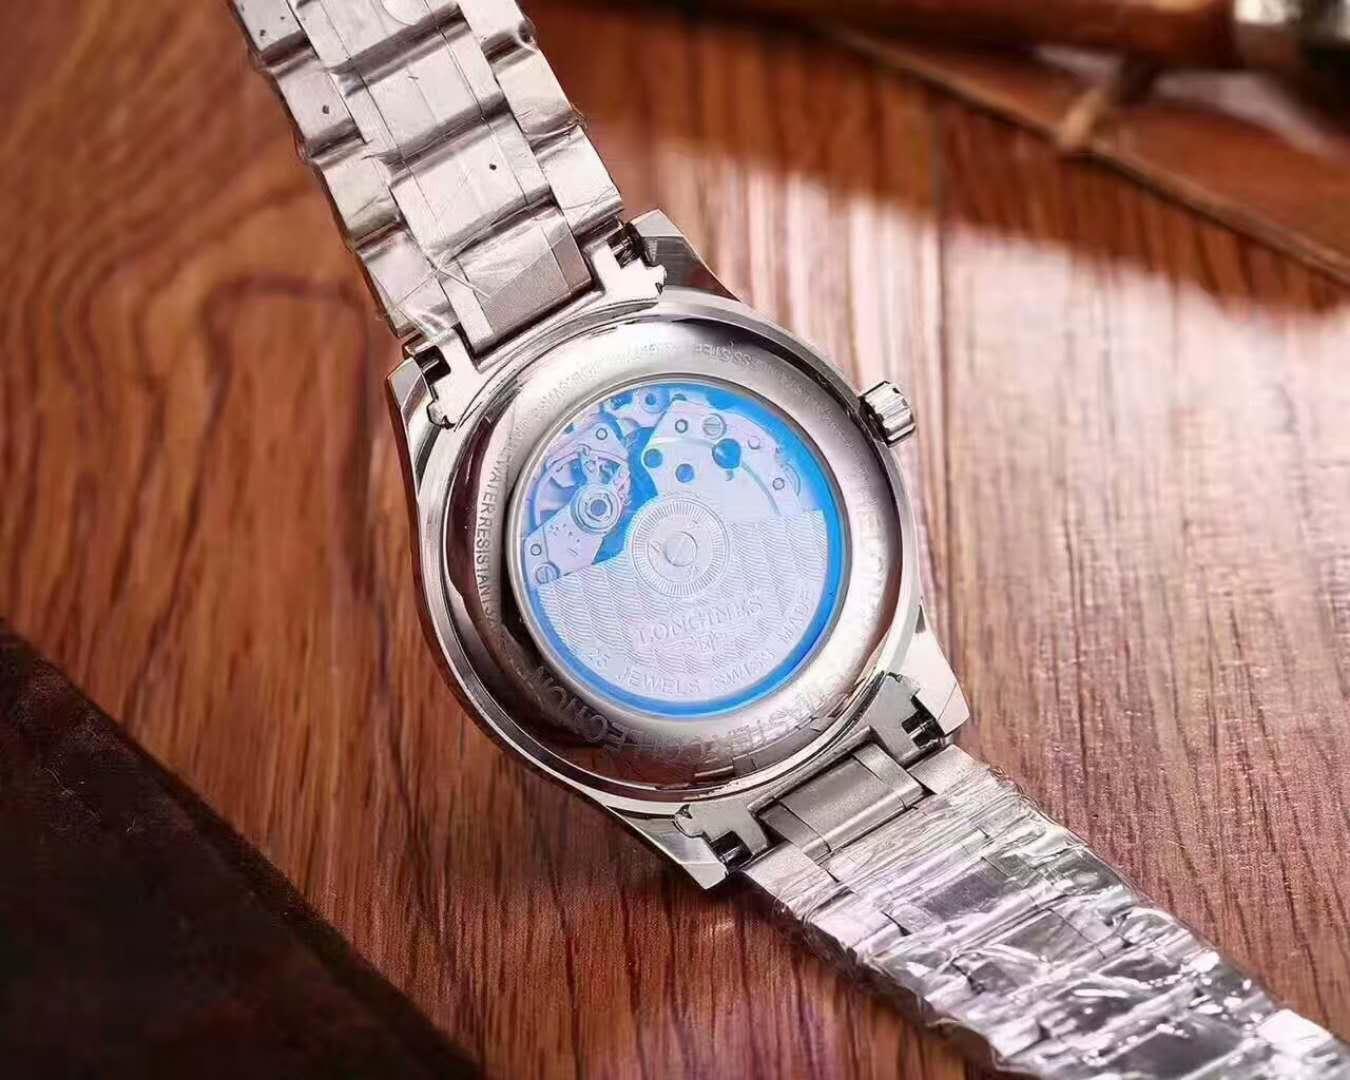 armani阿玛尼手表价格,广东armani阿玛尼手表厂家,广东armani阿玛尼手表供货商